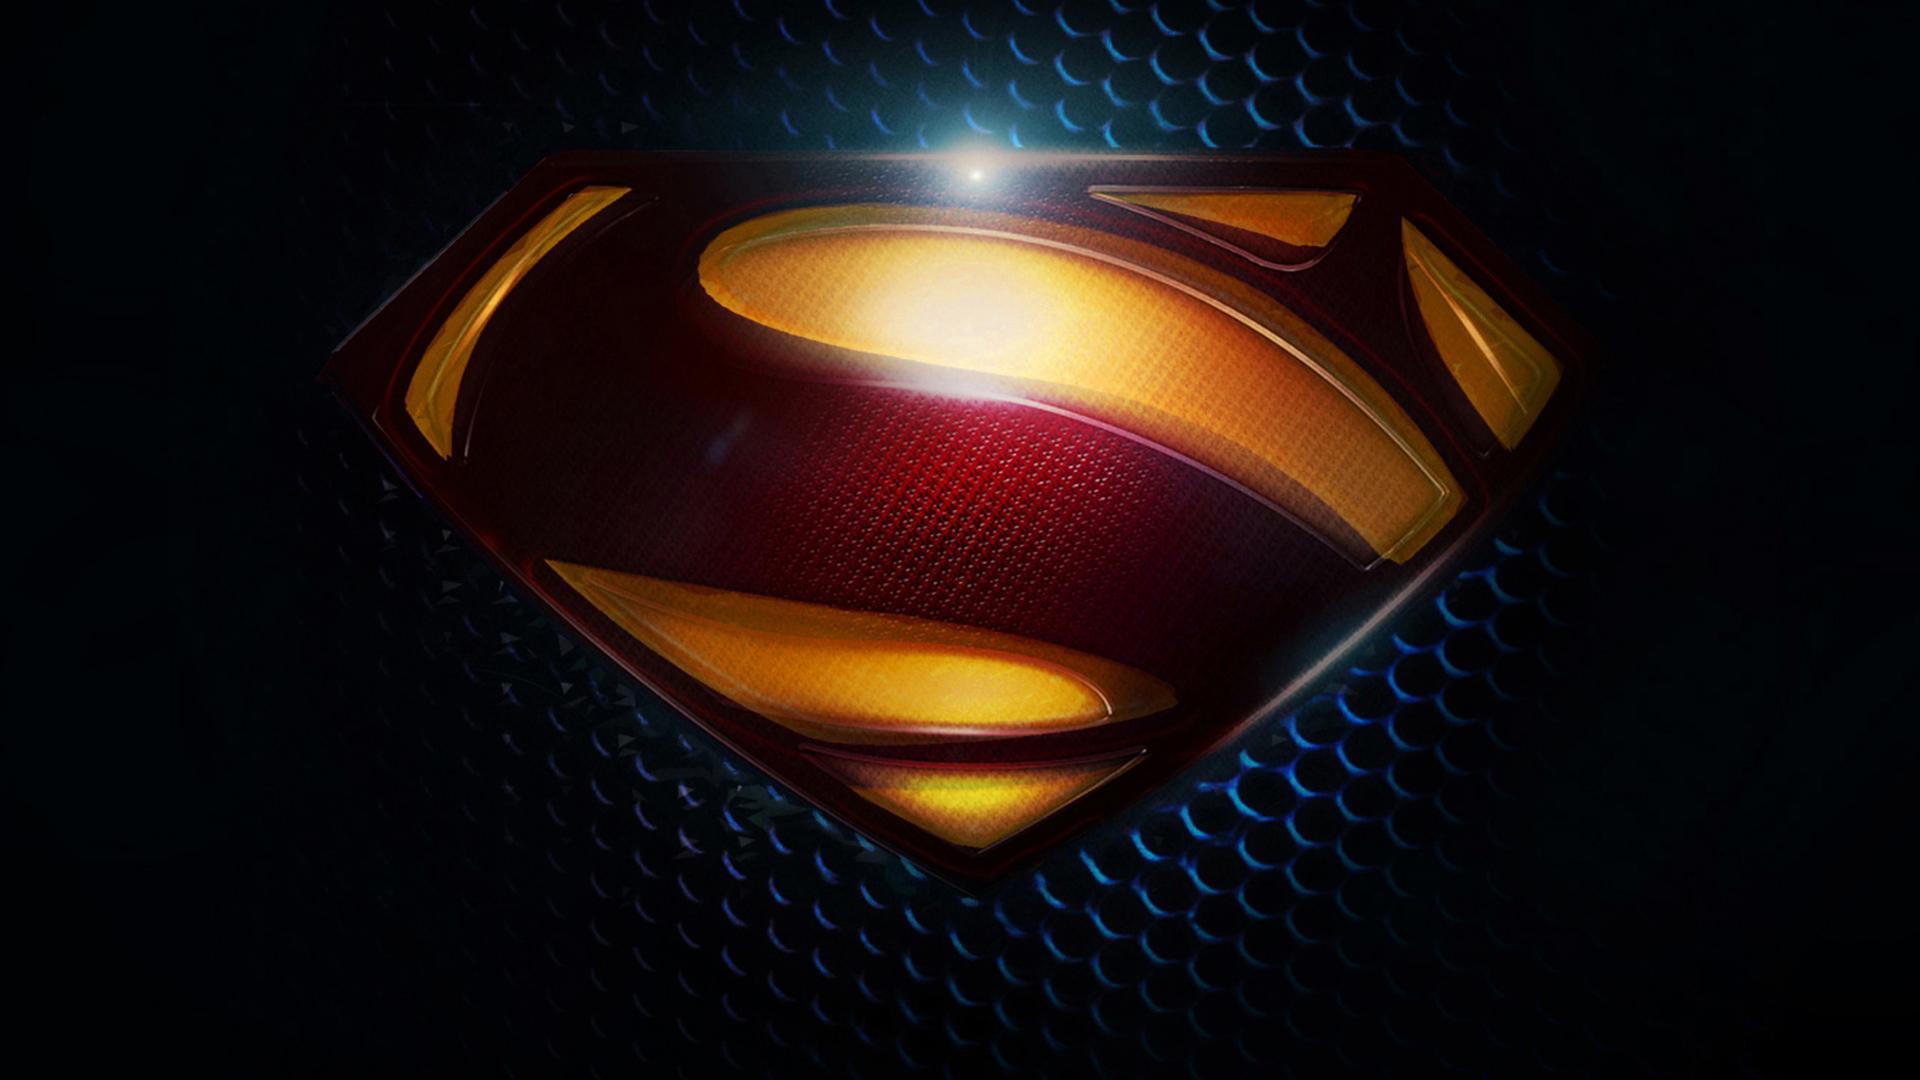 Wallpapers For Superman Man Of Steel Wallpaper Hd 1920x1080 1920x1080